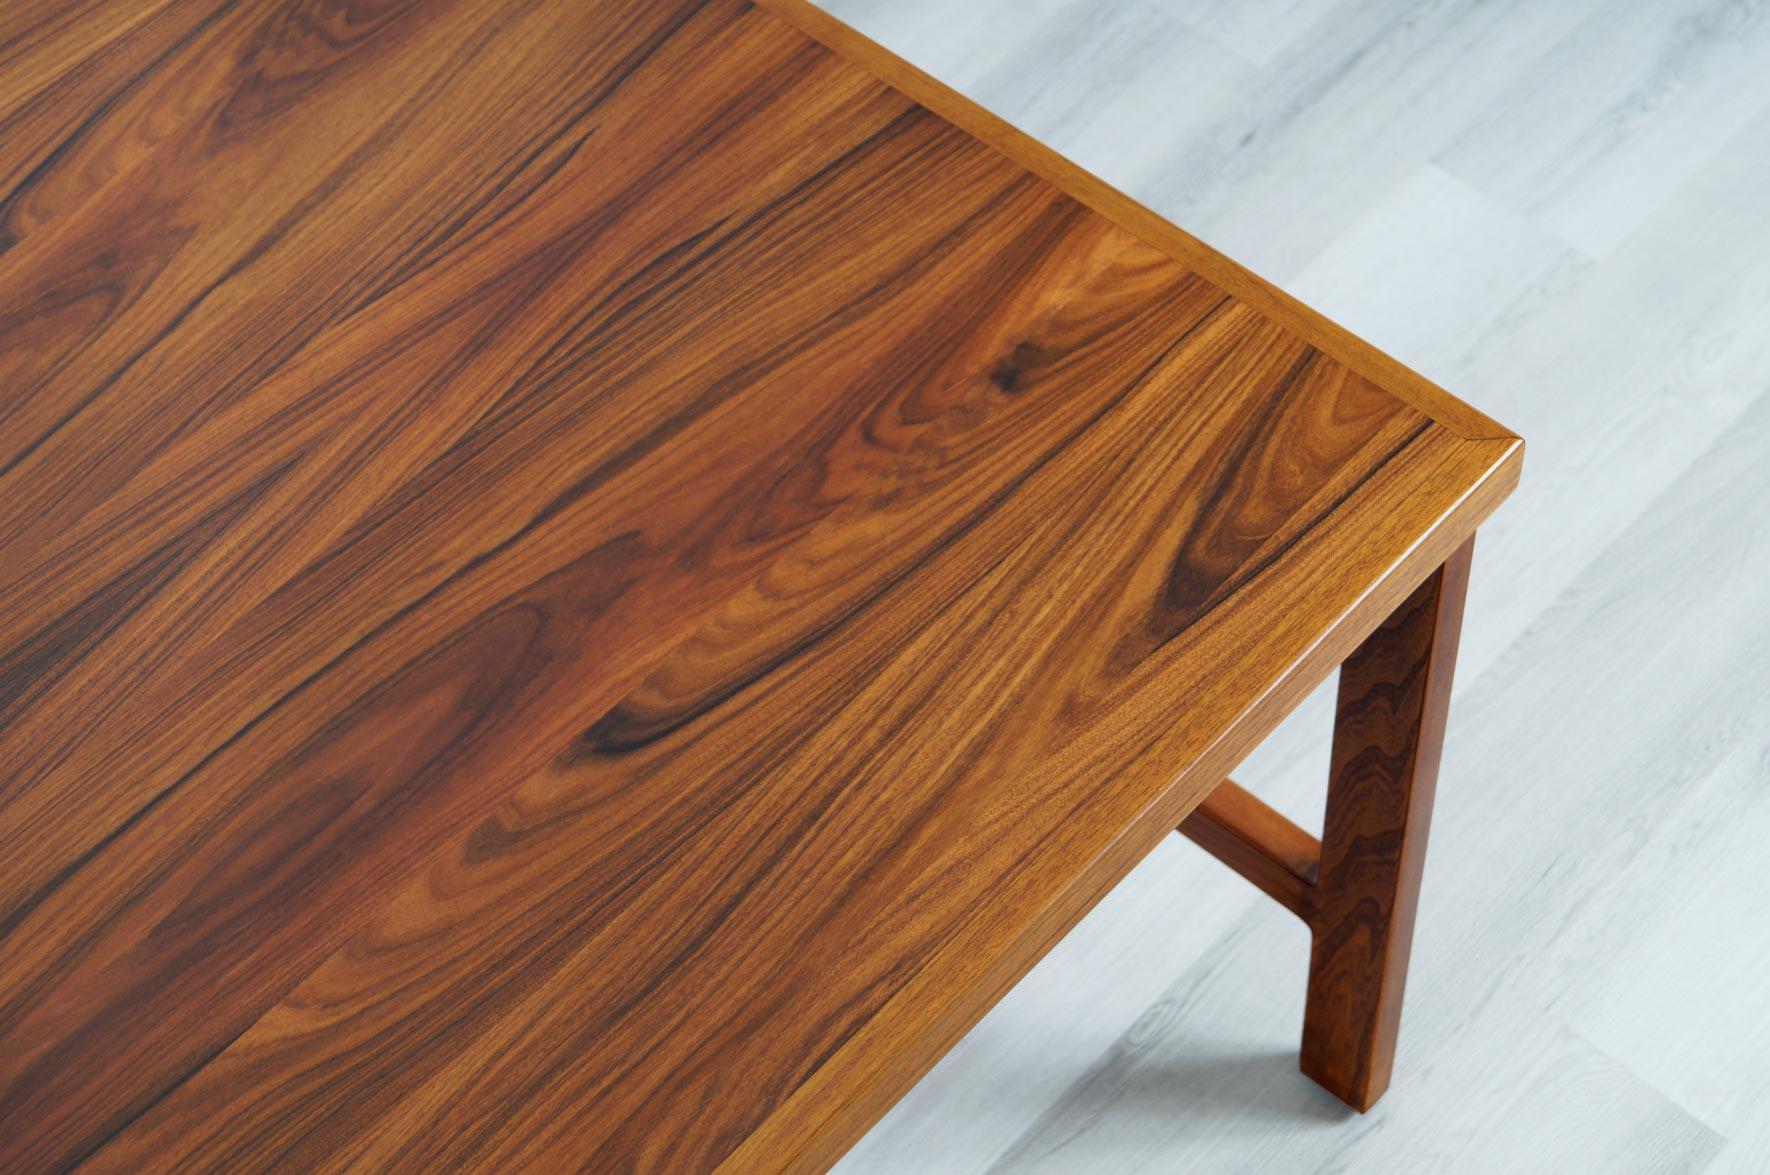 Danish Rosewood Executive Desk by Arne Vodder for H.P Hansen